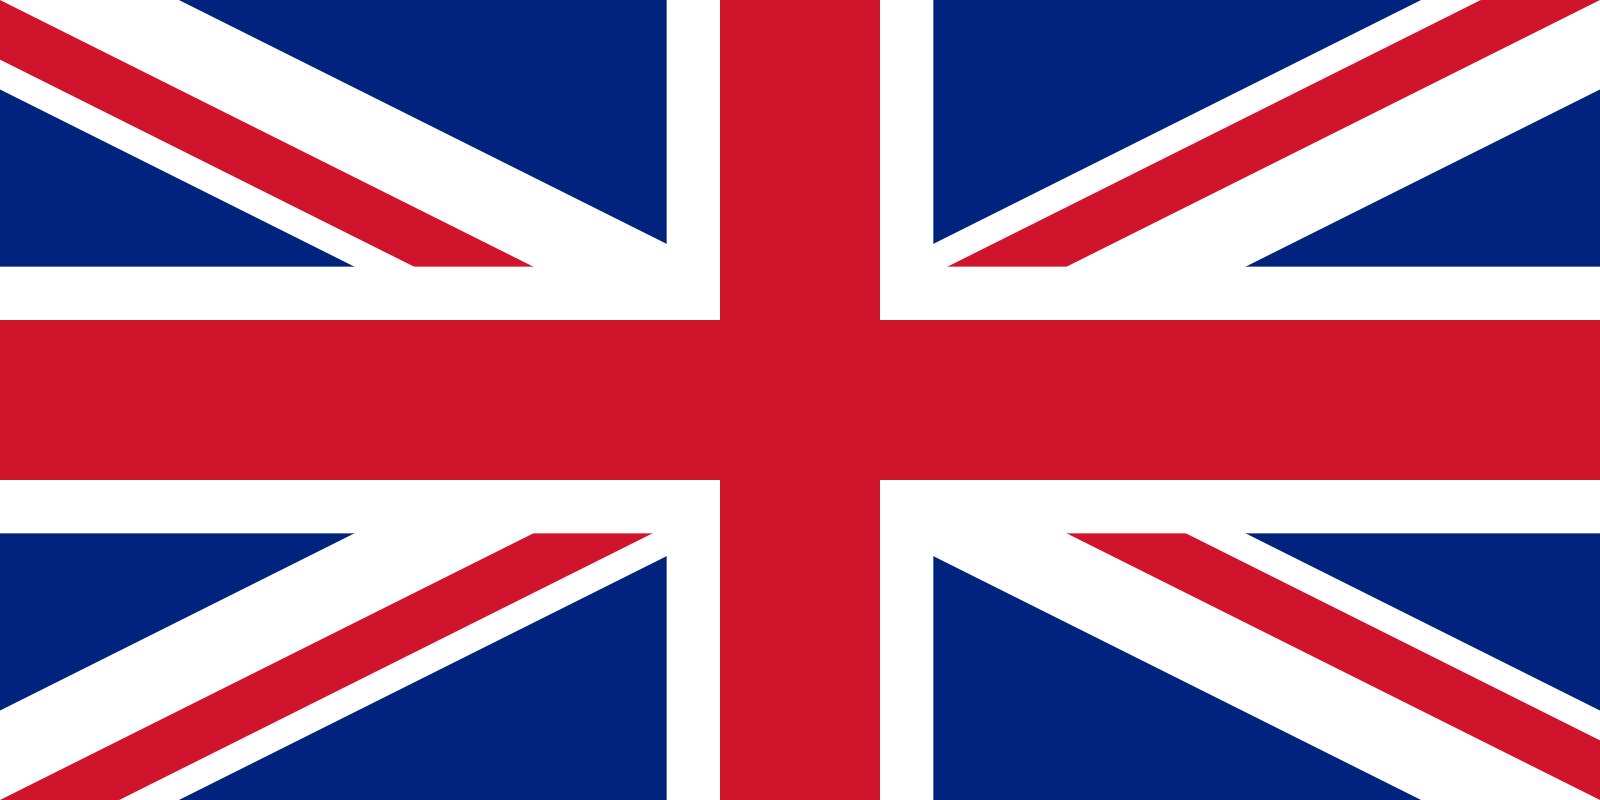 vlajka-britanie